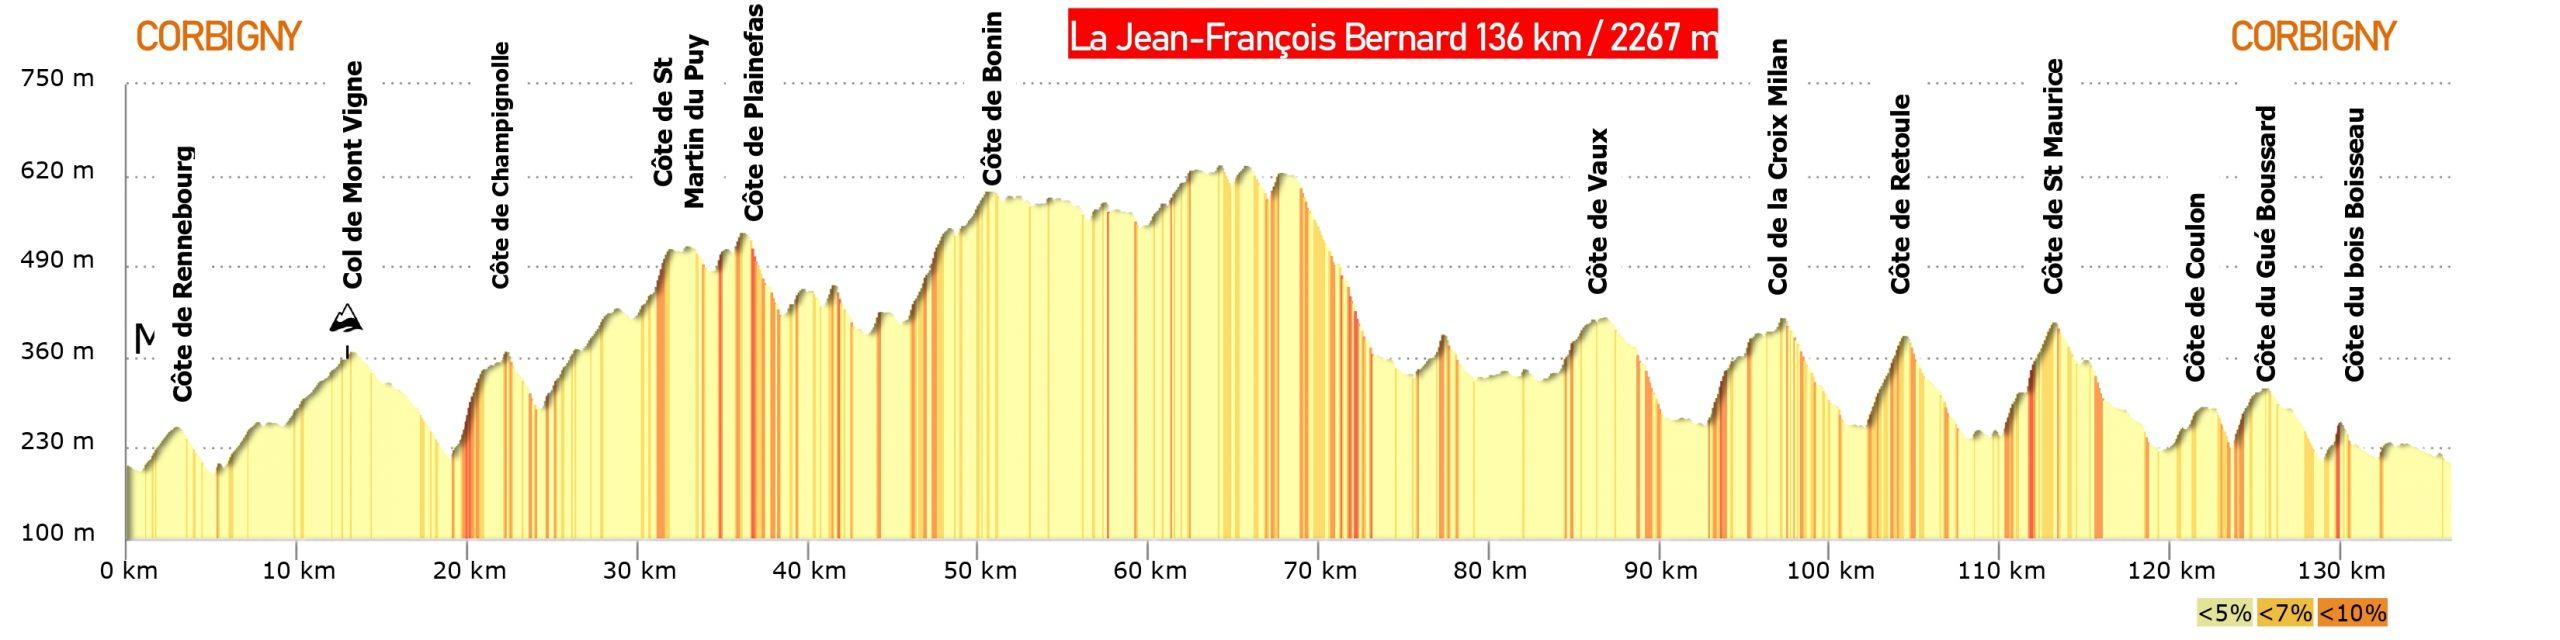 la jean-françois bernard profil